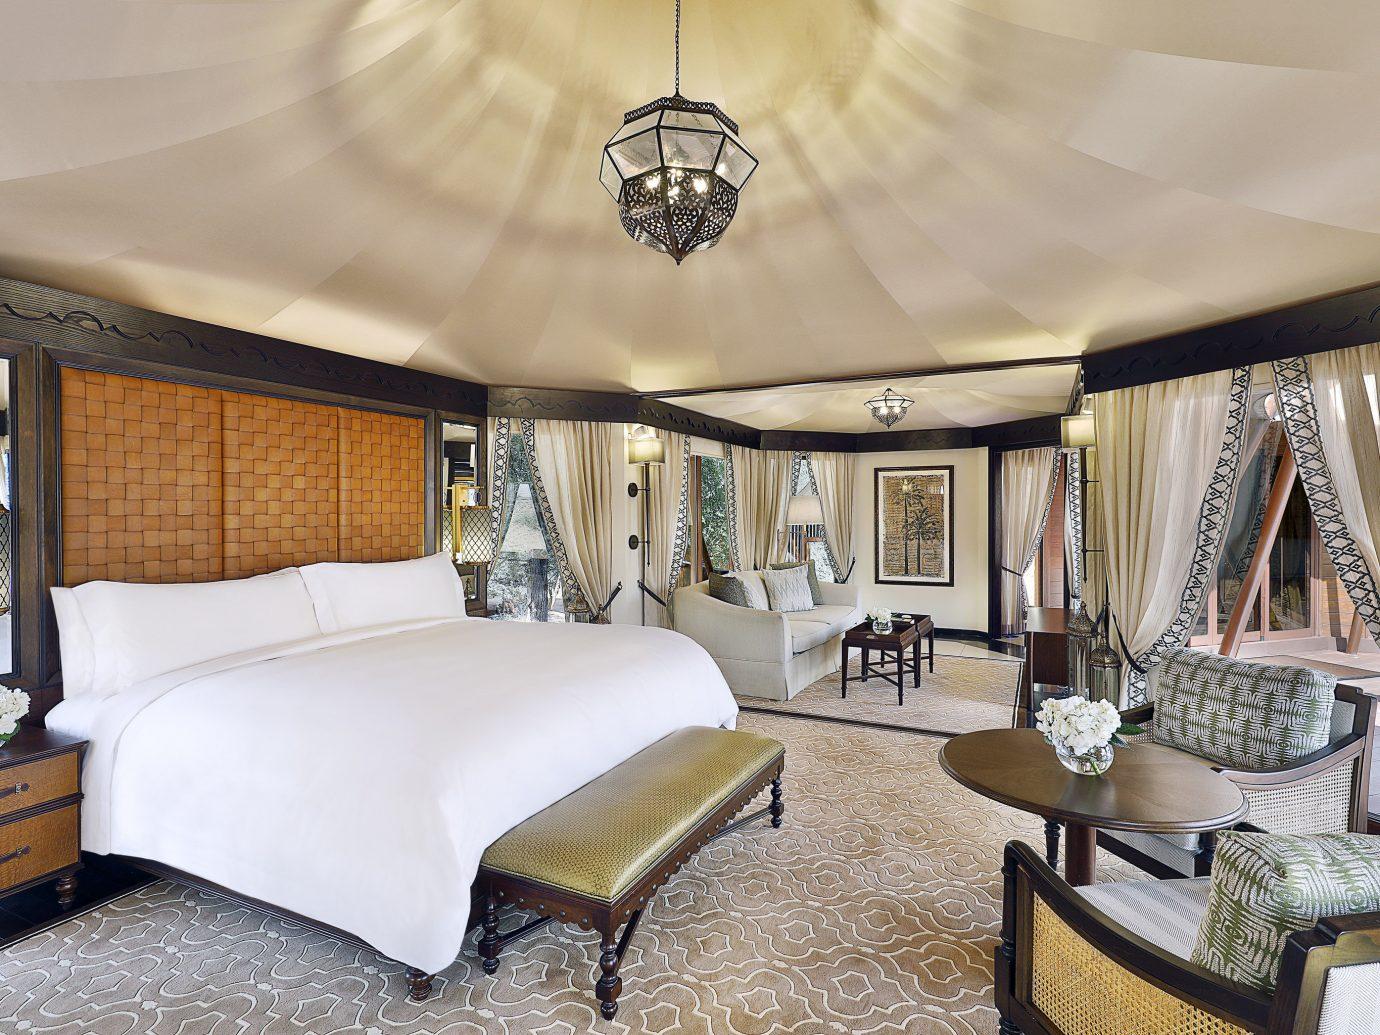 Trip Ideas indoor floor room ceiling interior design Suite Bedroom estate real estate home furniture